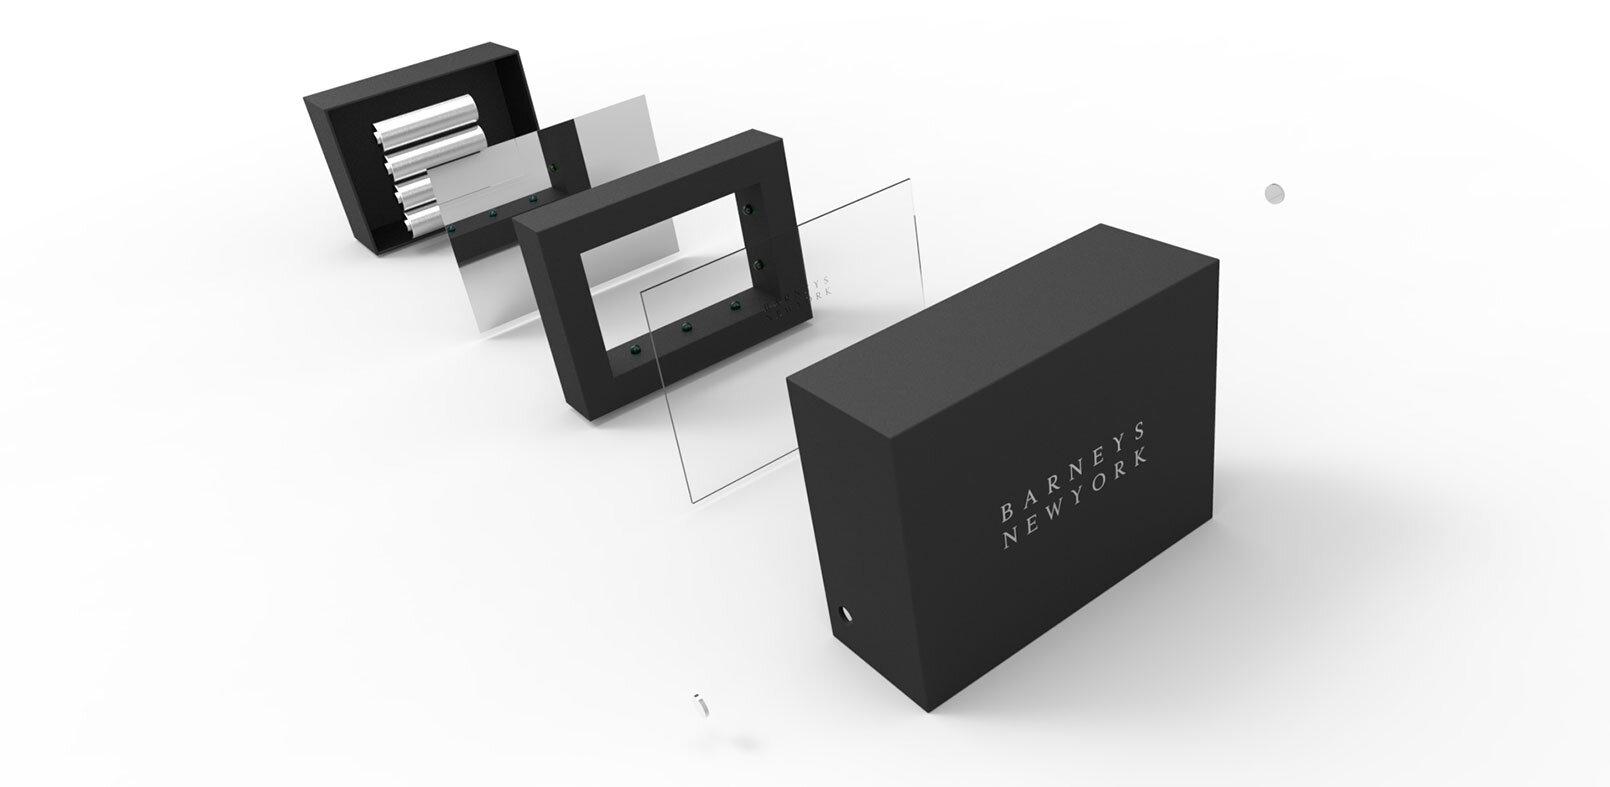 Barneys-New-York-Disney-Holiday-Packaging-Company-Design-6.JPG